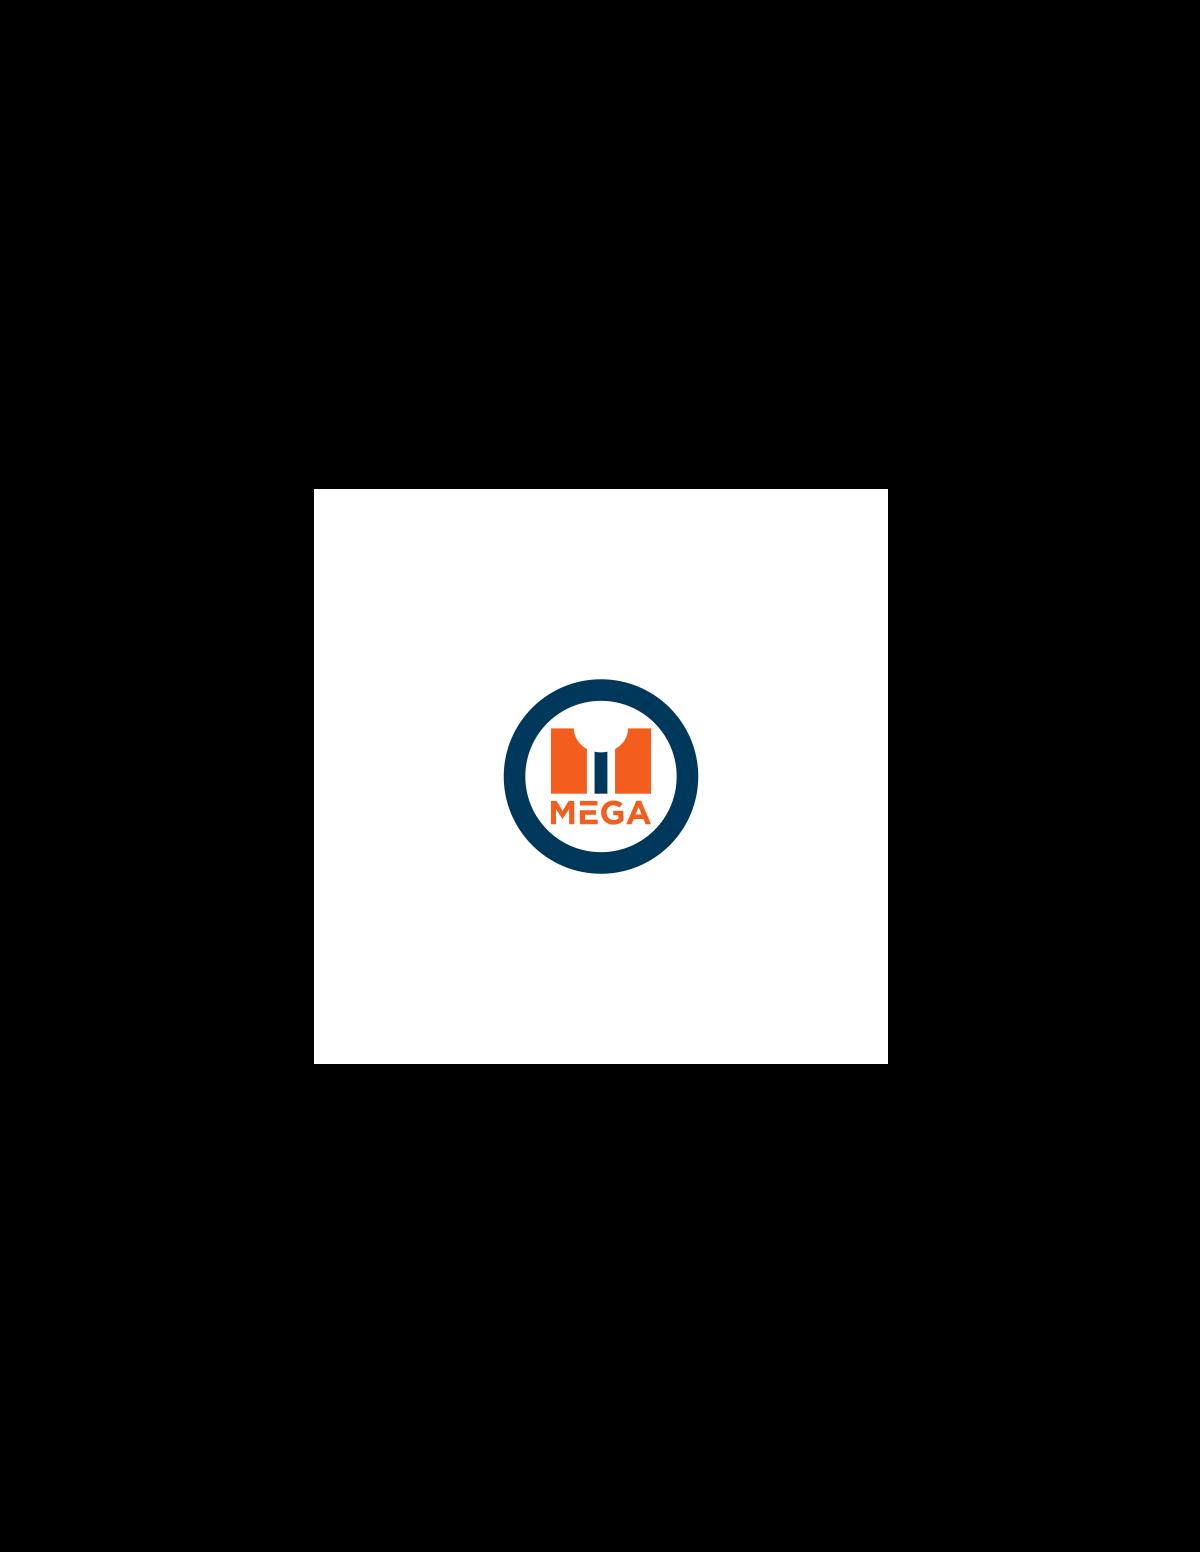 Revise Omega logo to Mega